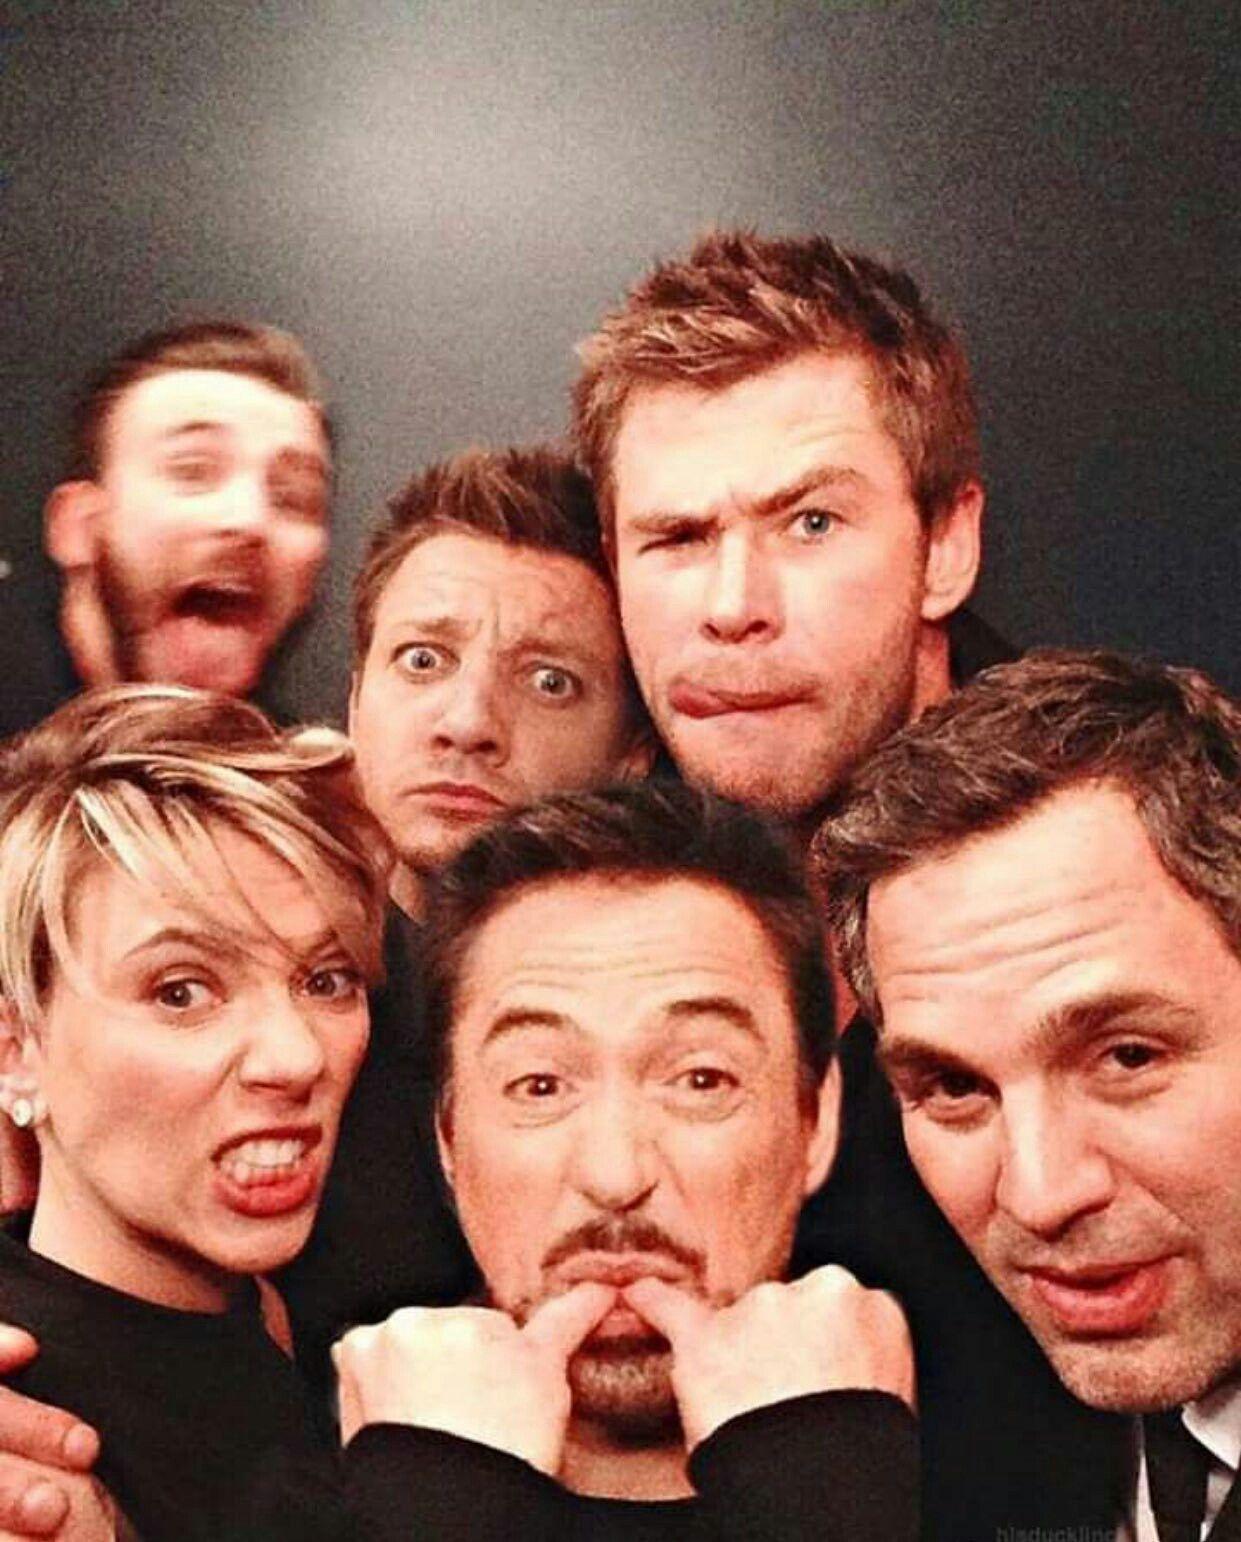 Chris Evans Jeremy Renner Hemsworth Scarlett Johansson Robert Downey Jr